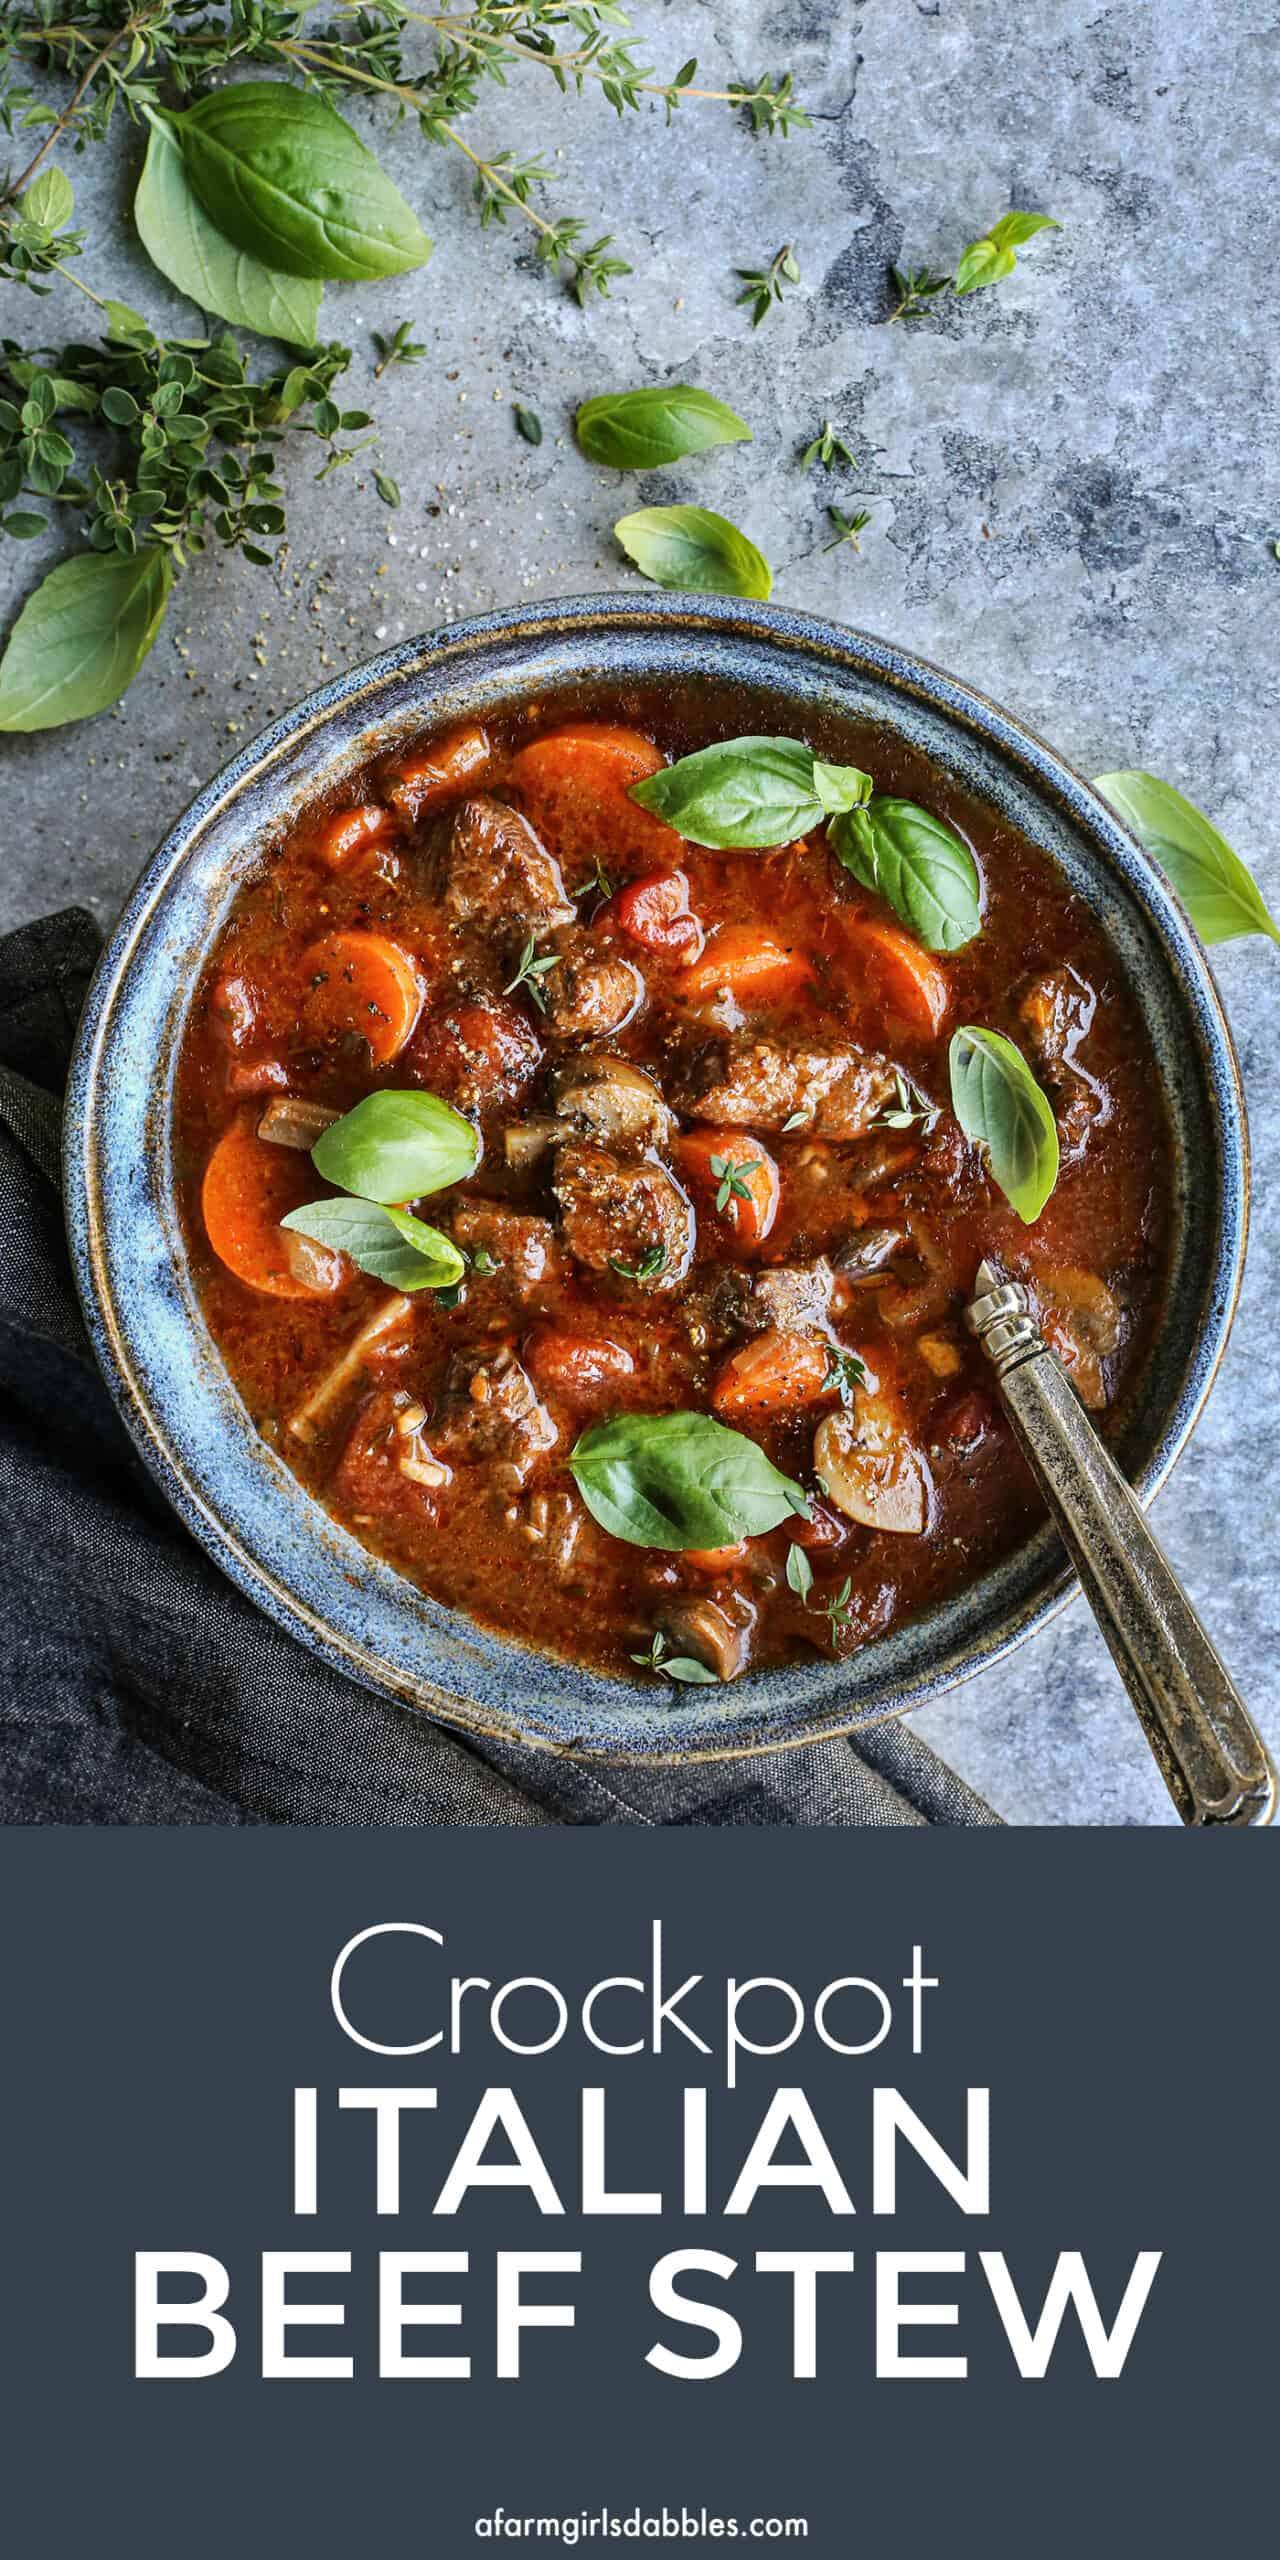 Pinterest image of Crockpot Italian Beef Stew